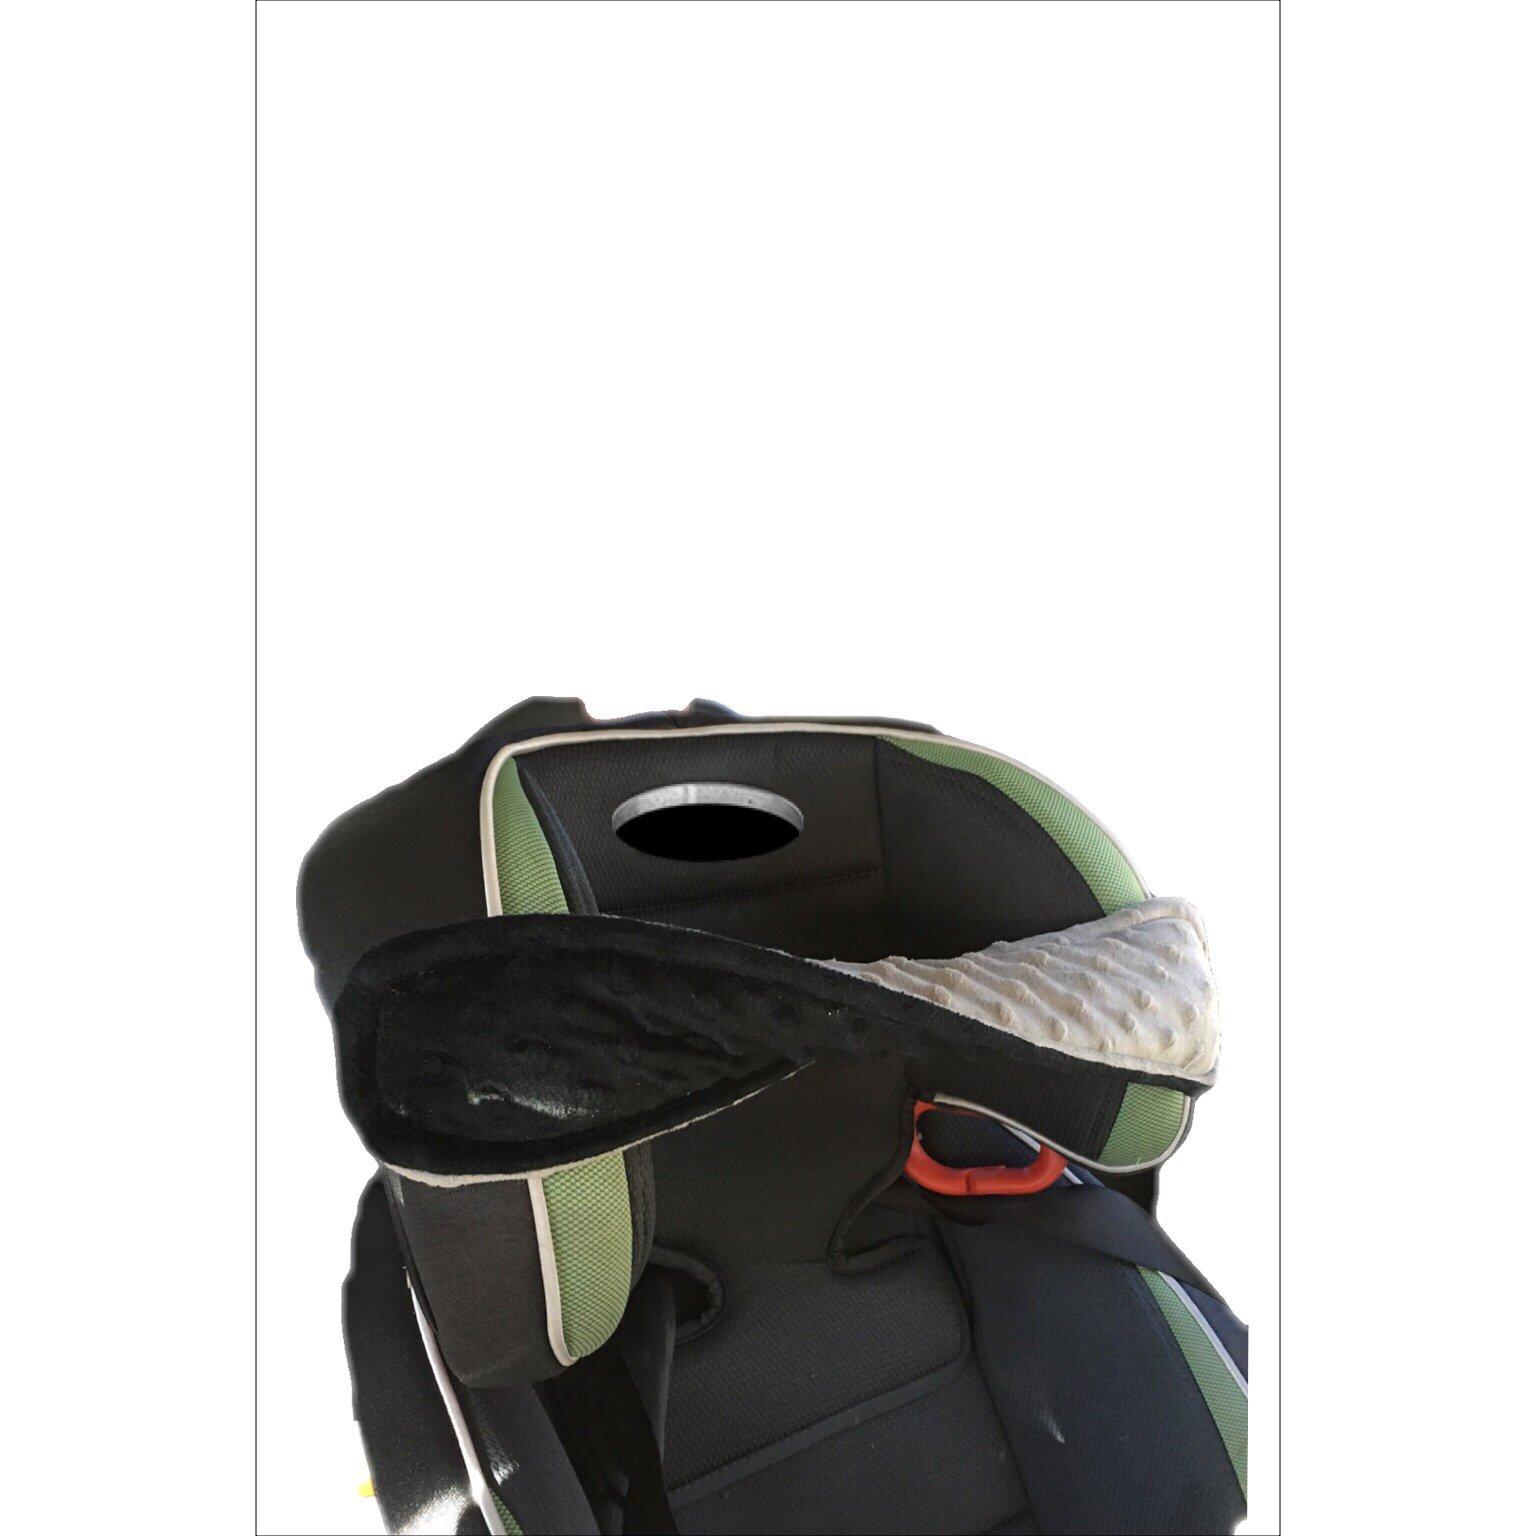 Big Bandz car seat pillow (Black/grey)